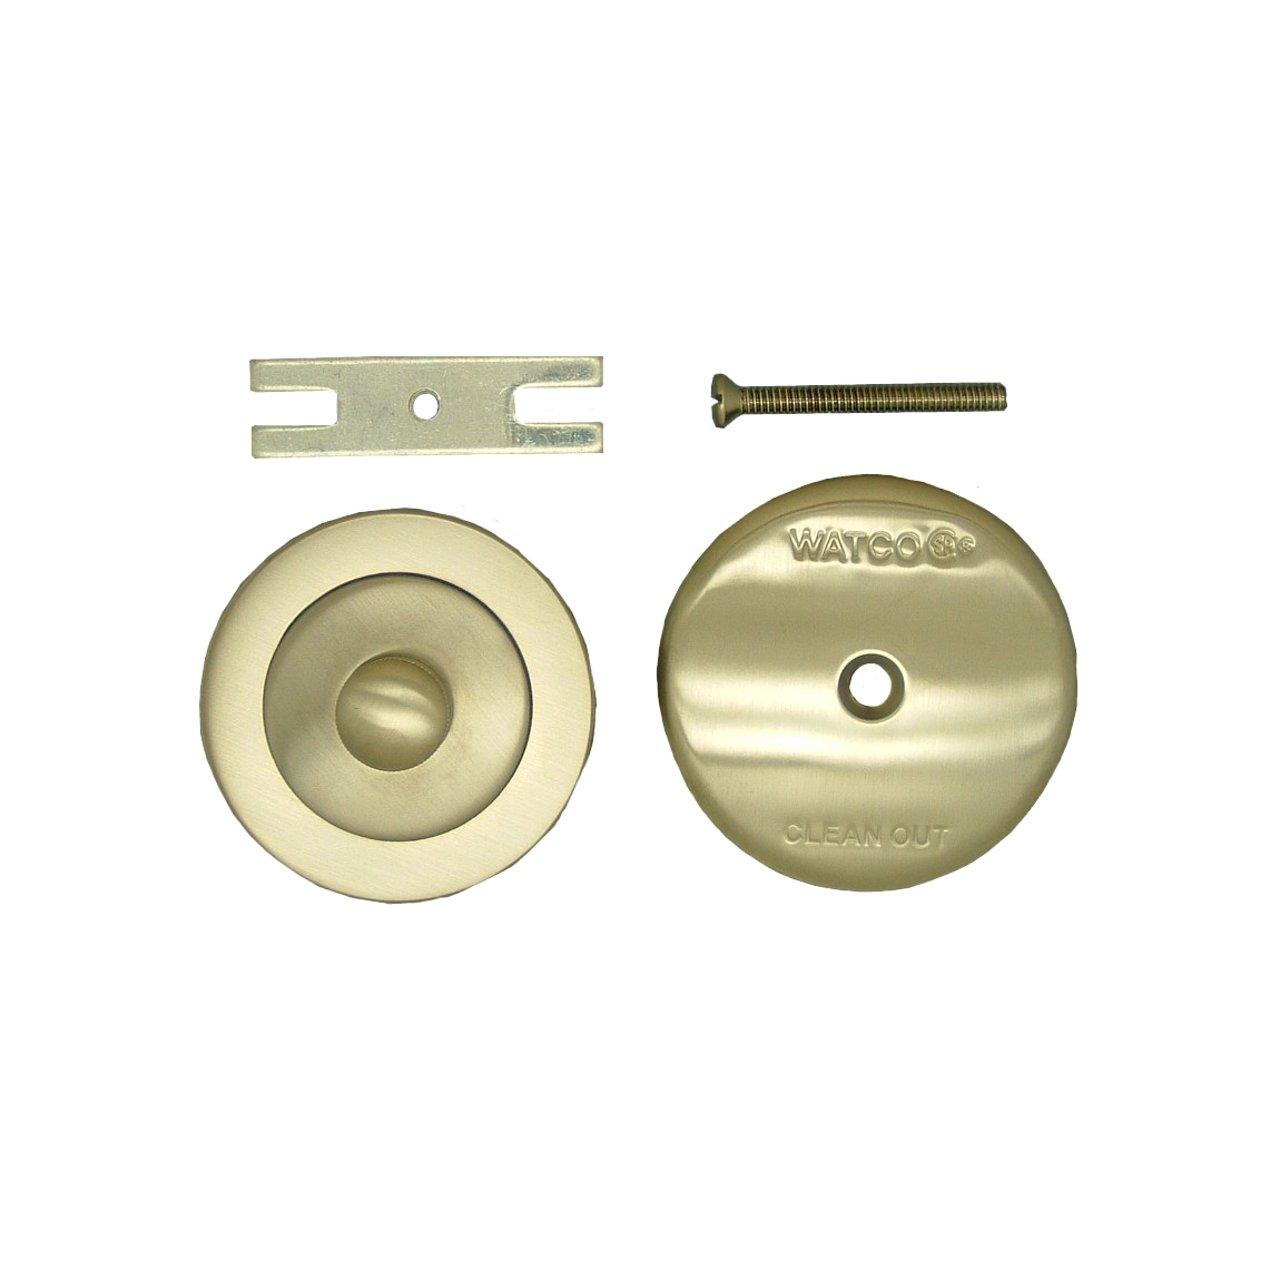 Watco Manufacturing 48400-BN NuFit Lift and Turn Trim Kit, Brushed Nickel